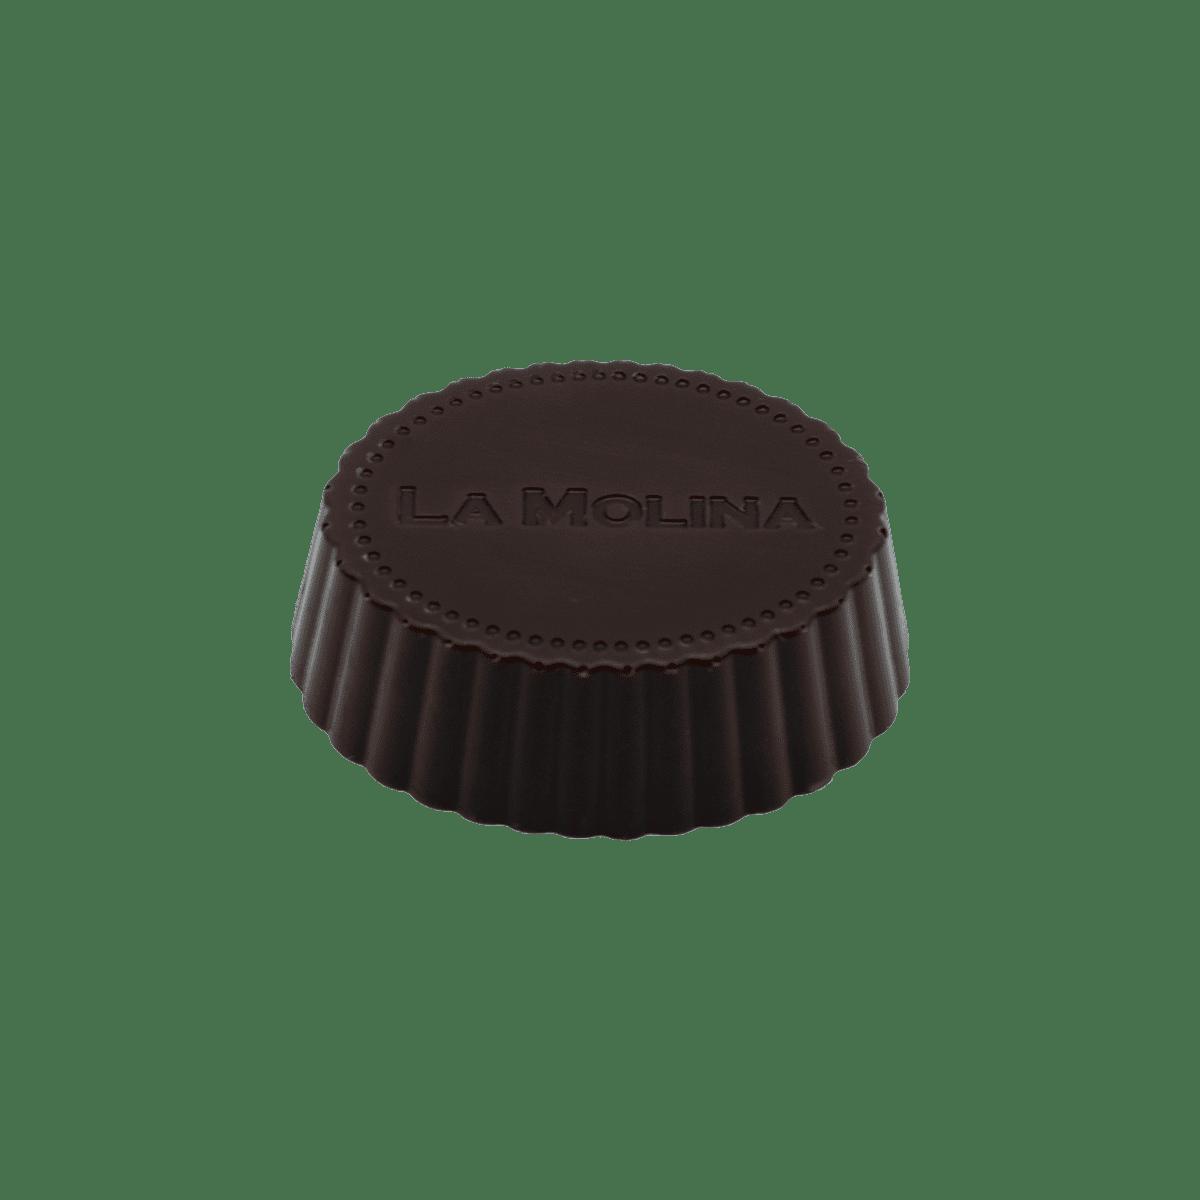 Pralina di Cioccolato fondente con ripieno di gianduia e grué